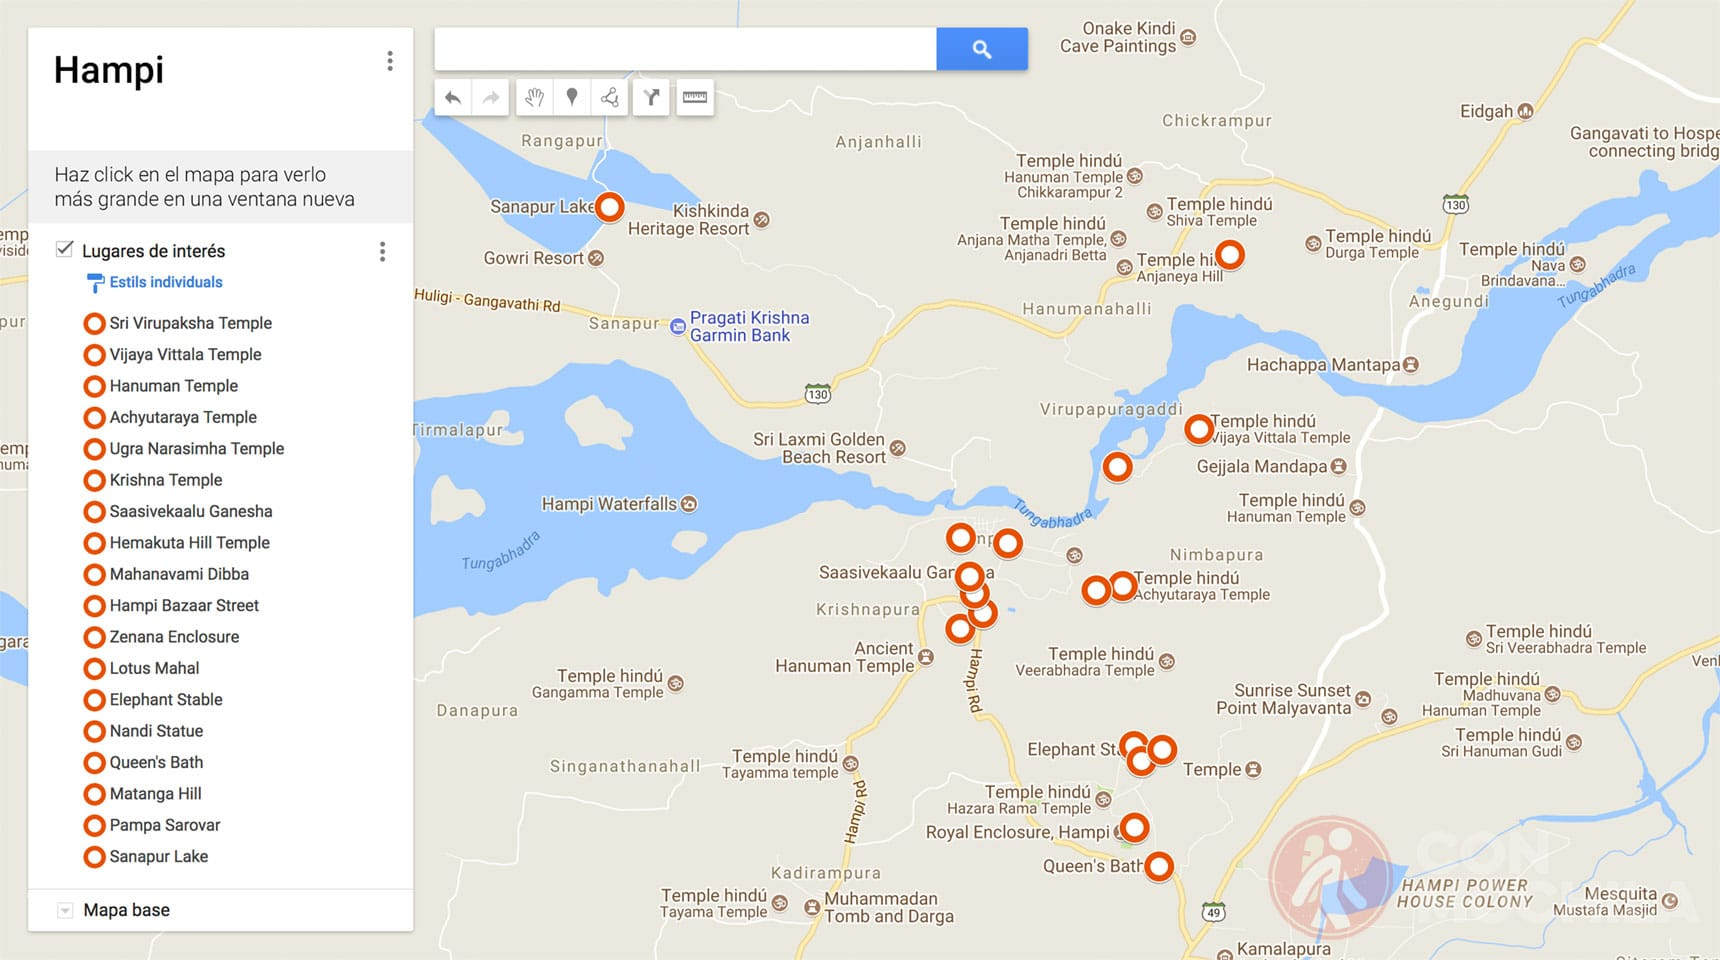 Mapa de Hampi